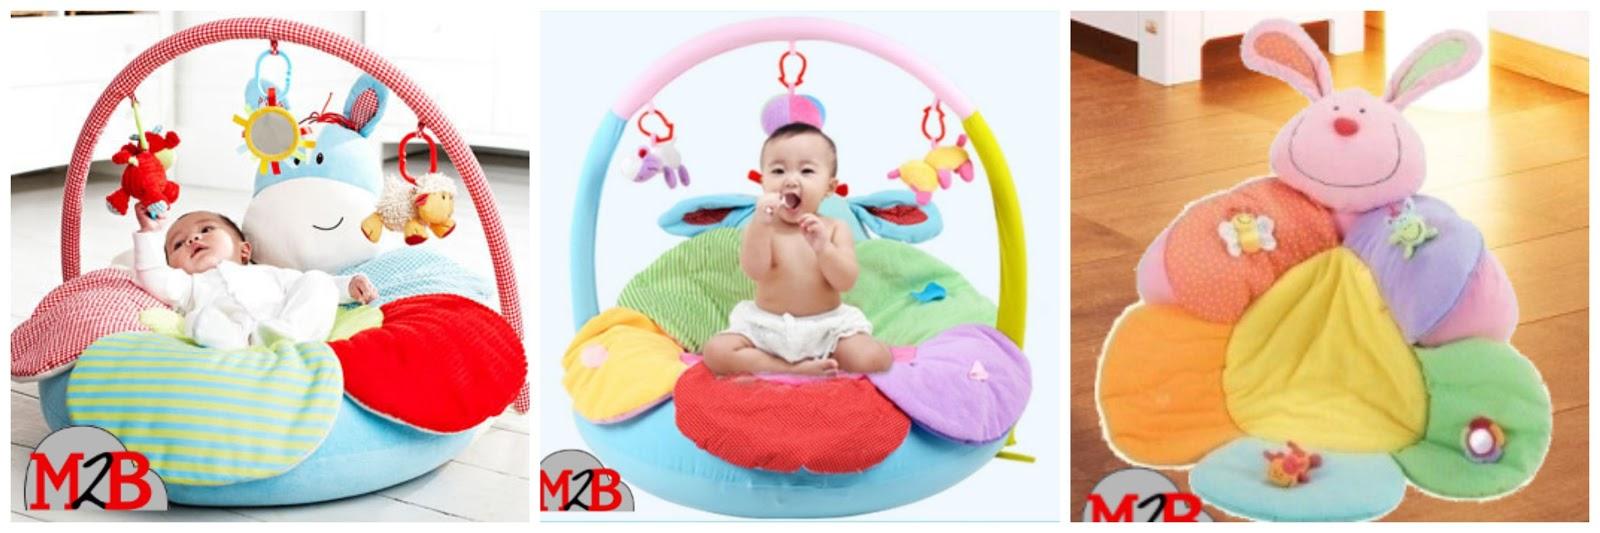 baby born online shop